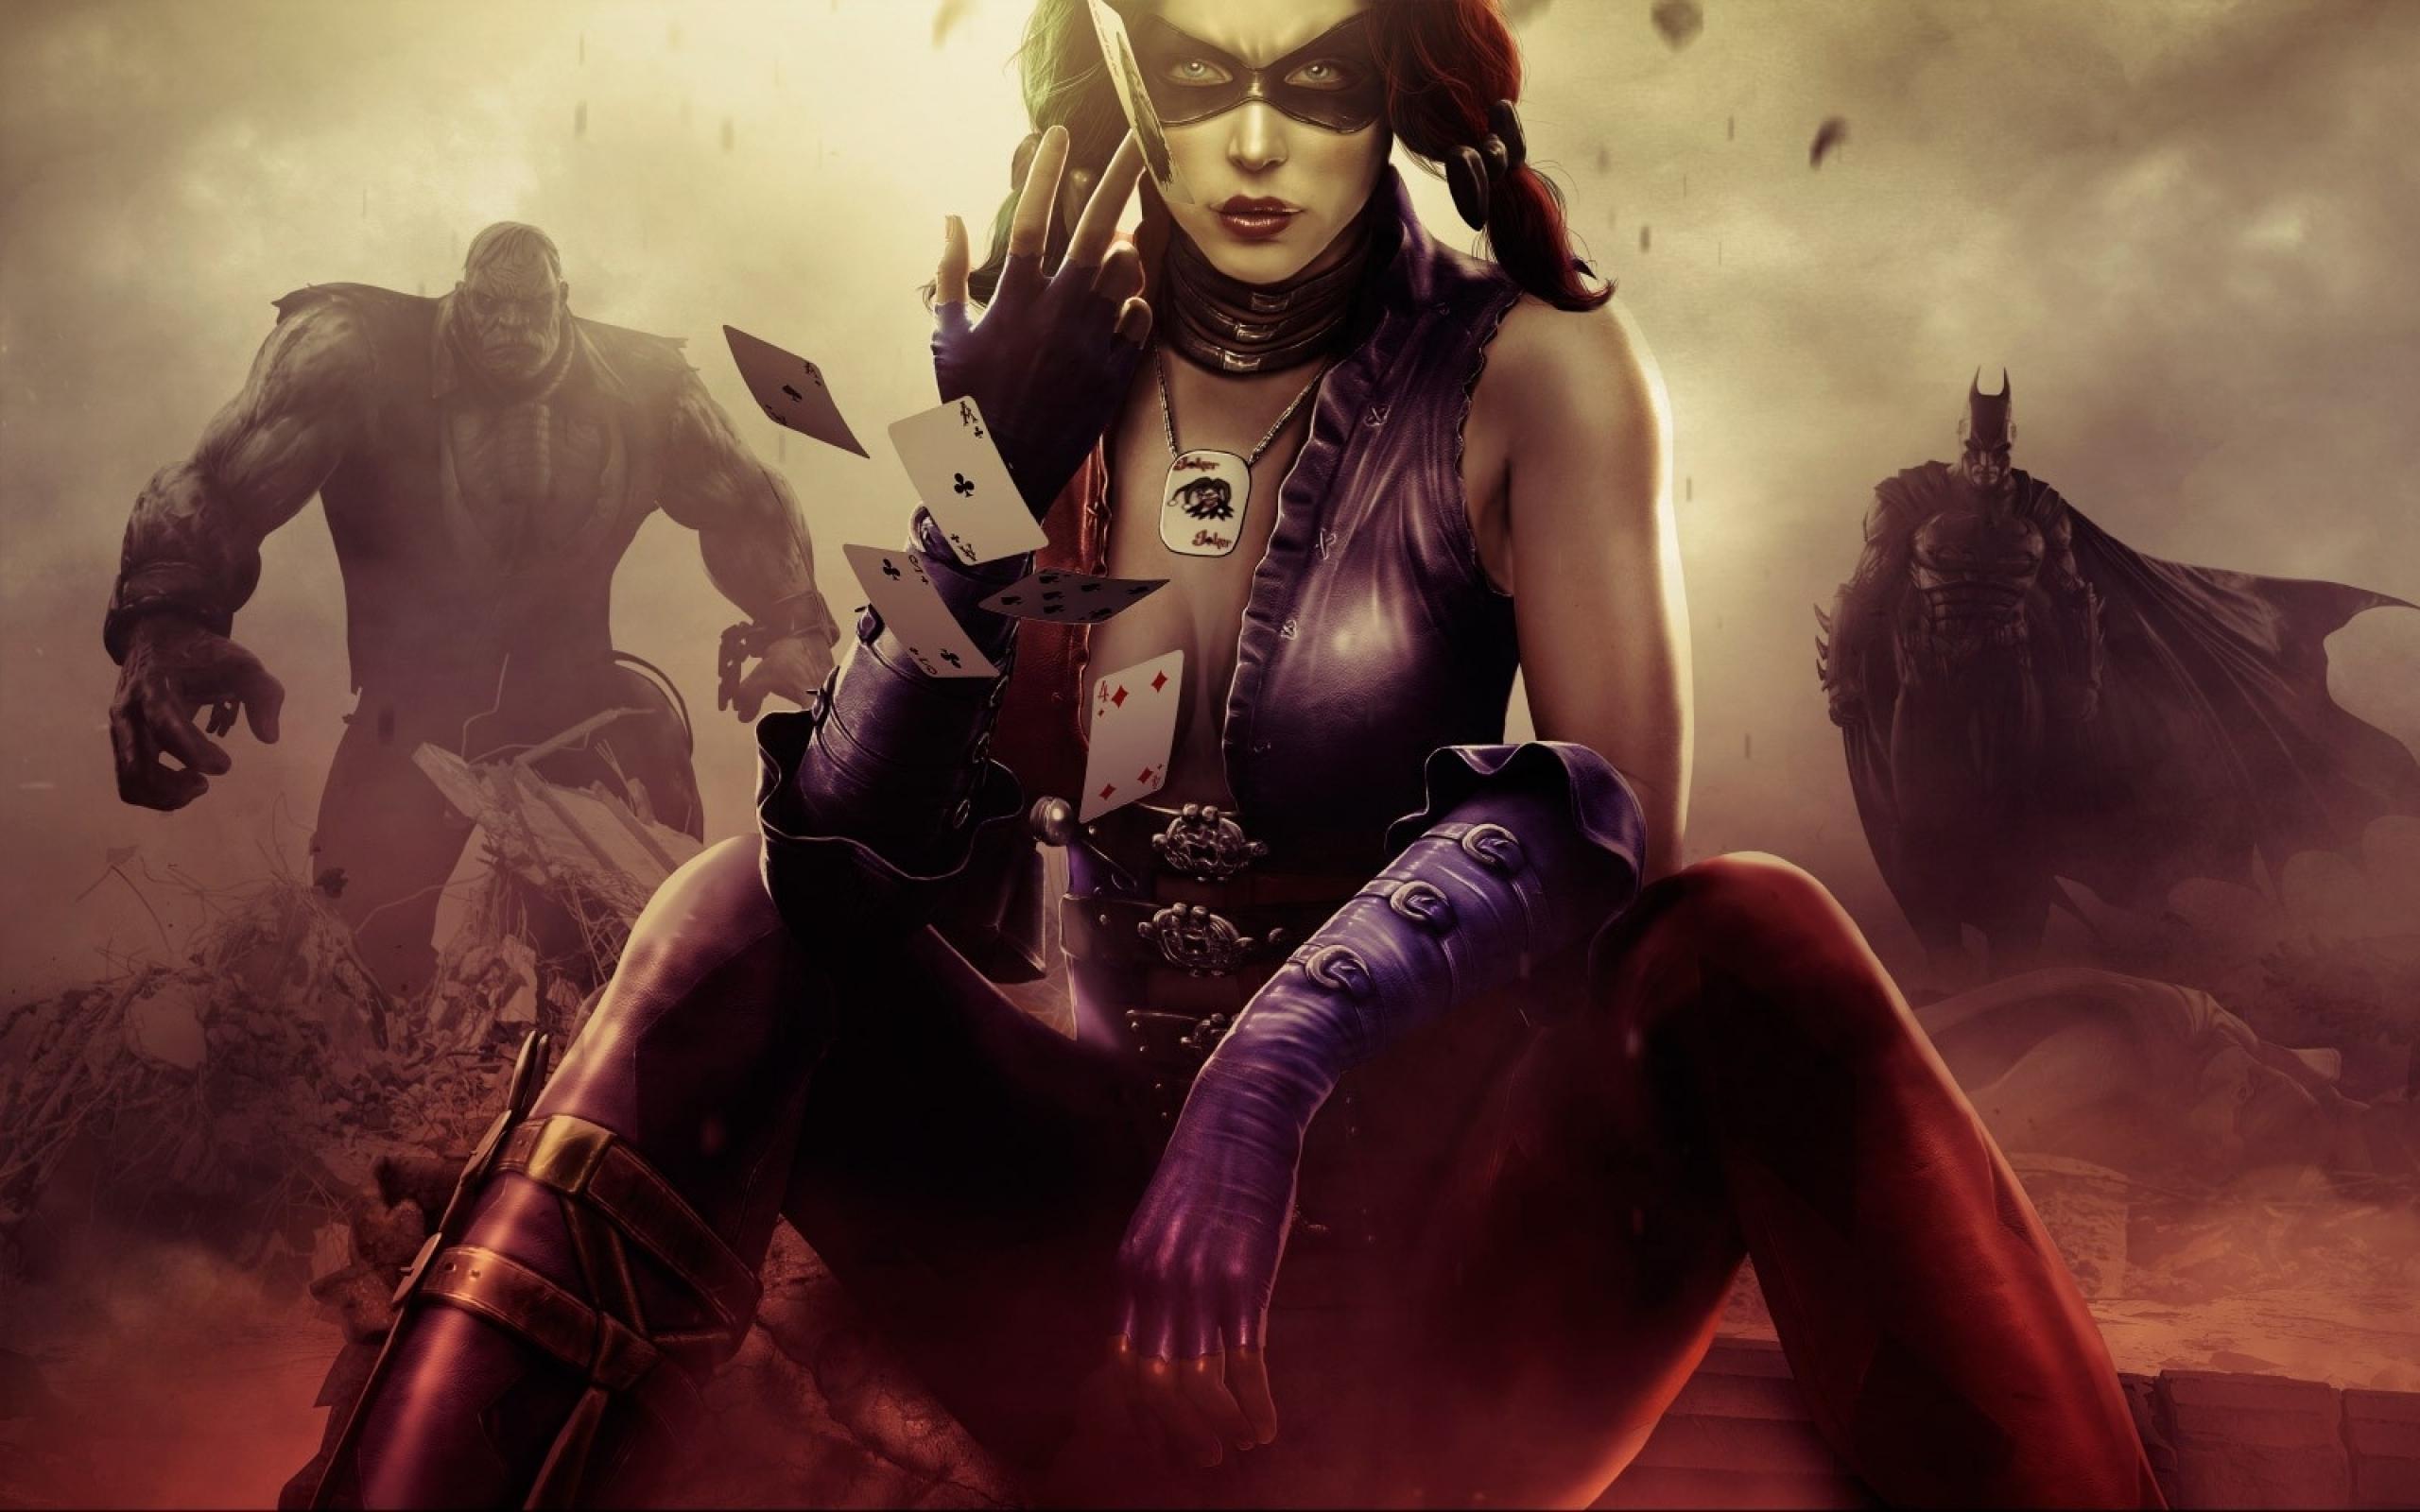 Картинка: Harley Quinn, карты, Solomon Grundy, Batman, Game, Injustice Gods Among Us